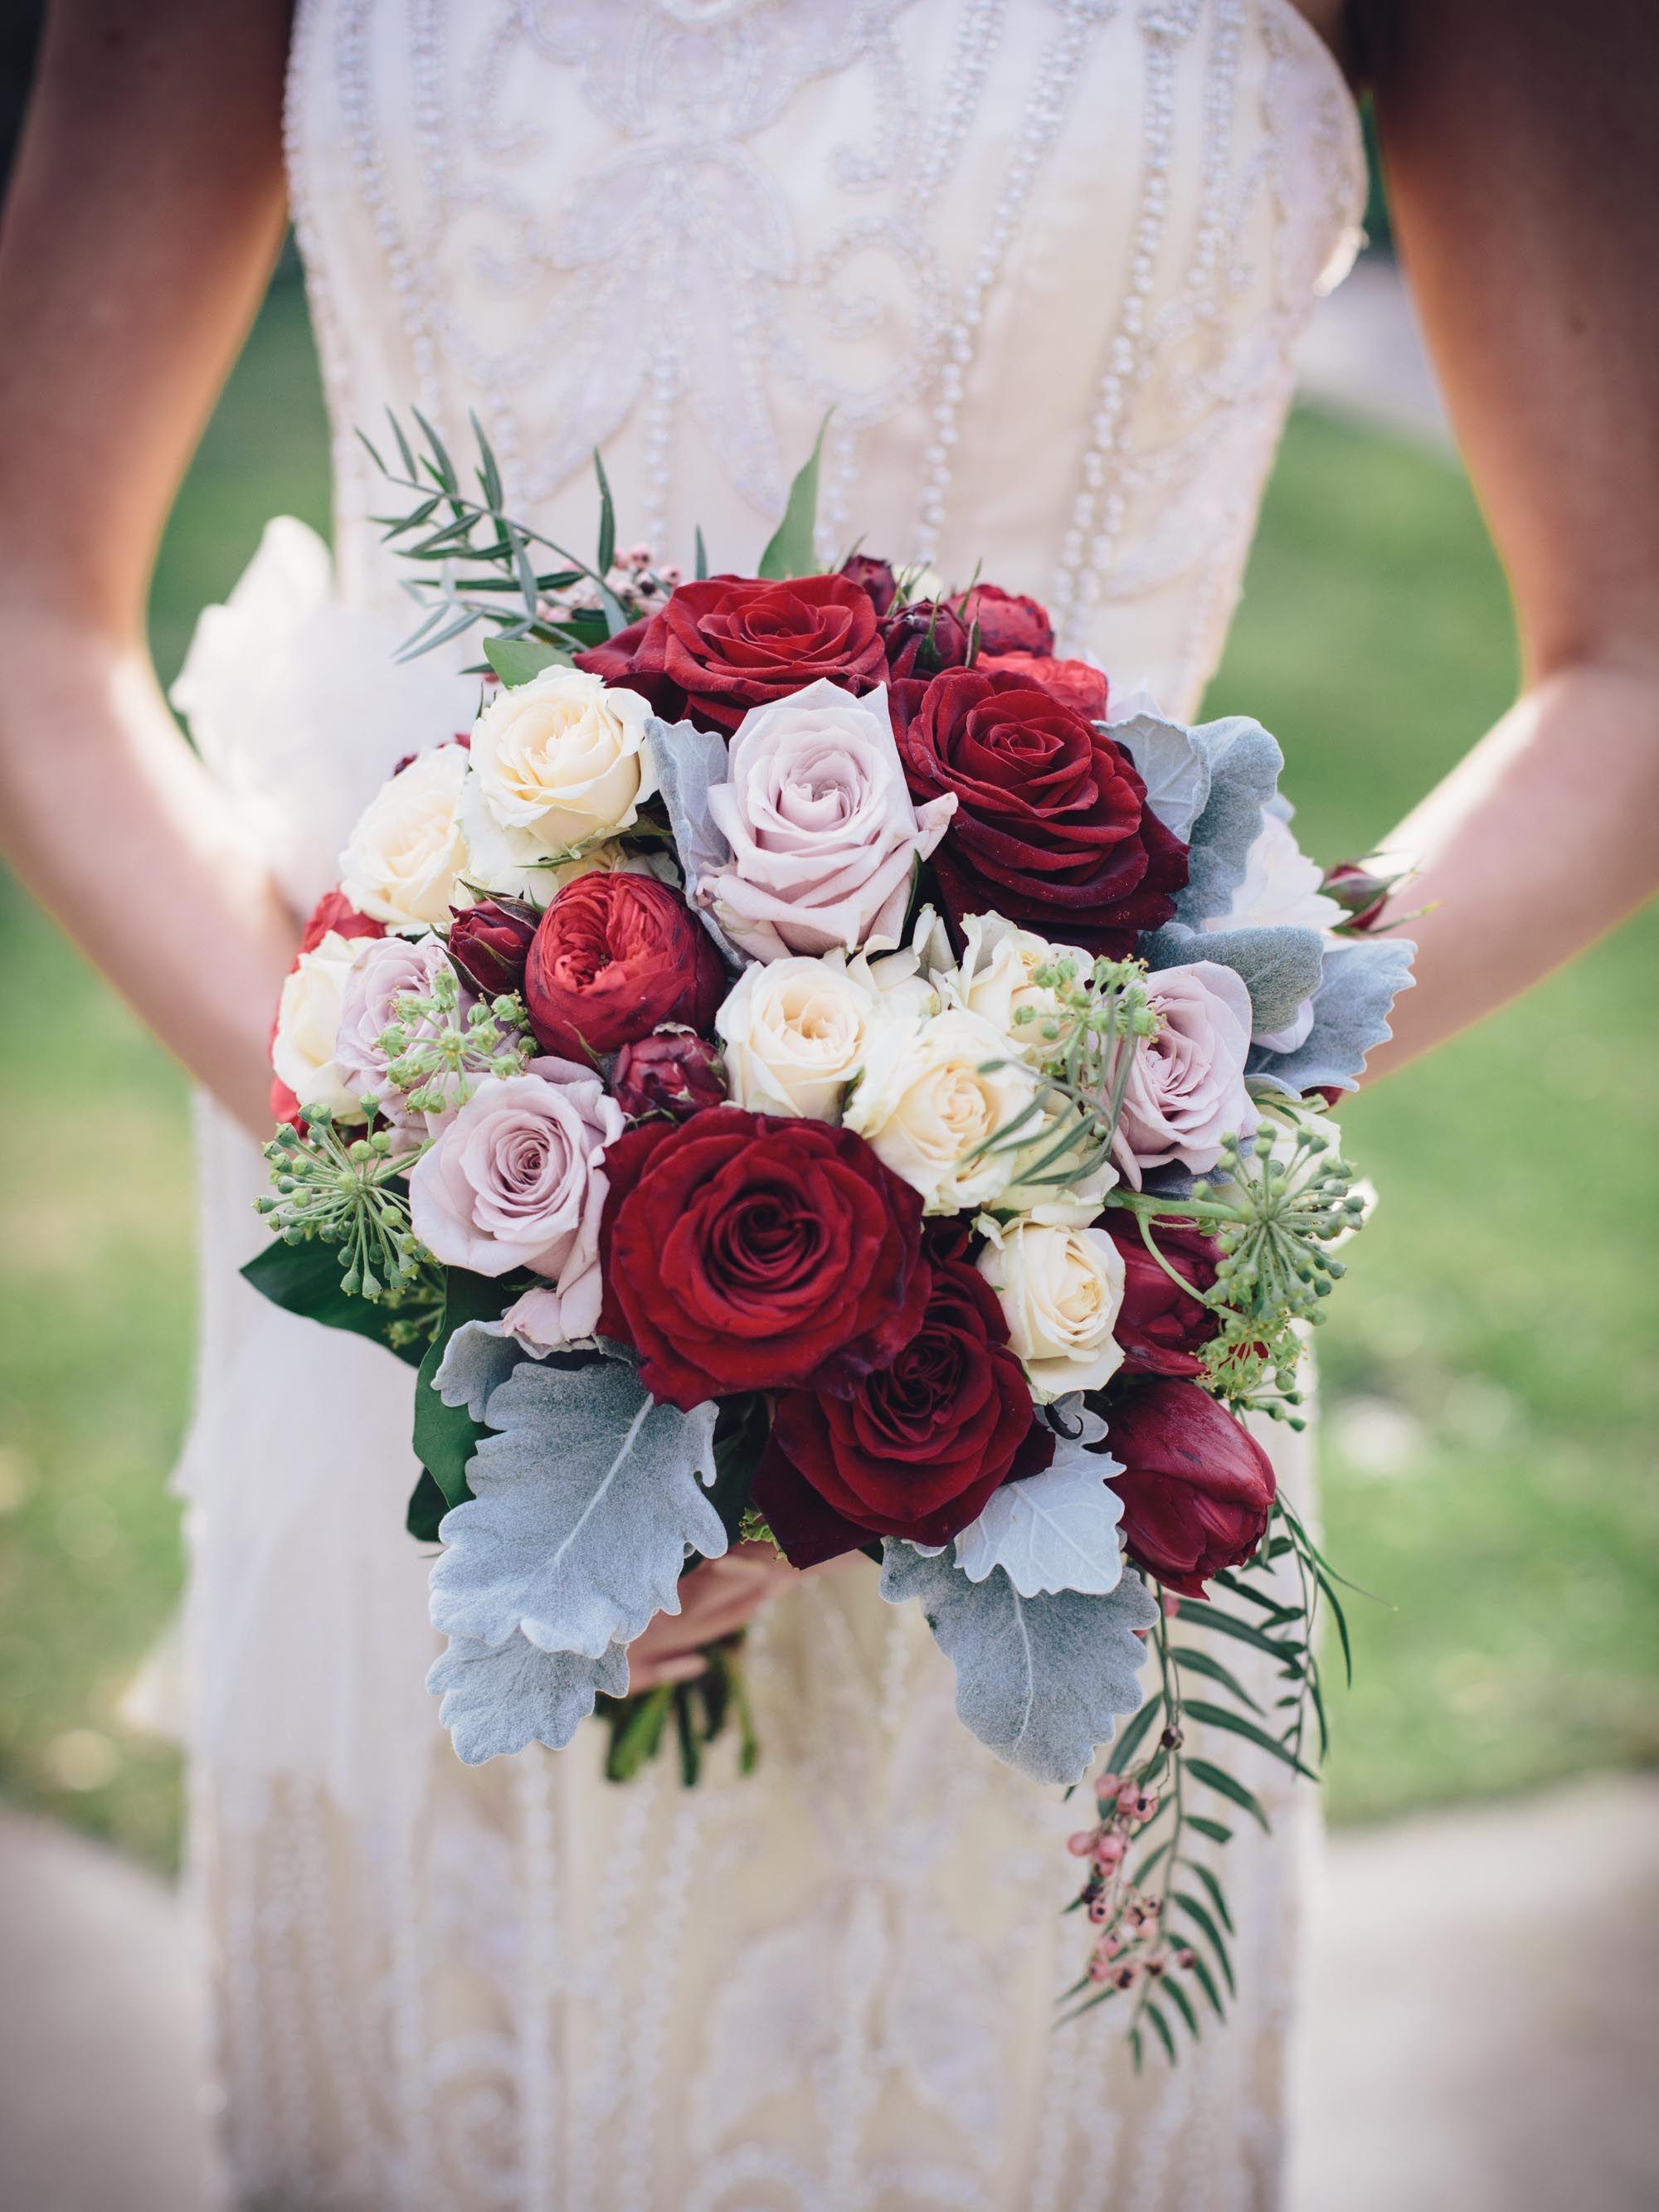 Provincial Bride Ginninderry Homestead Red Rose Wedding Rose